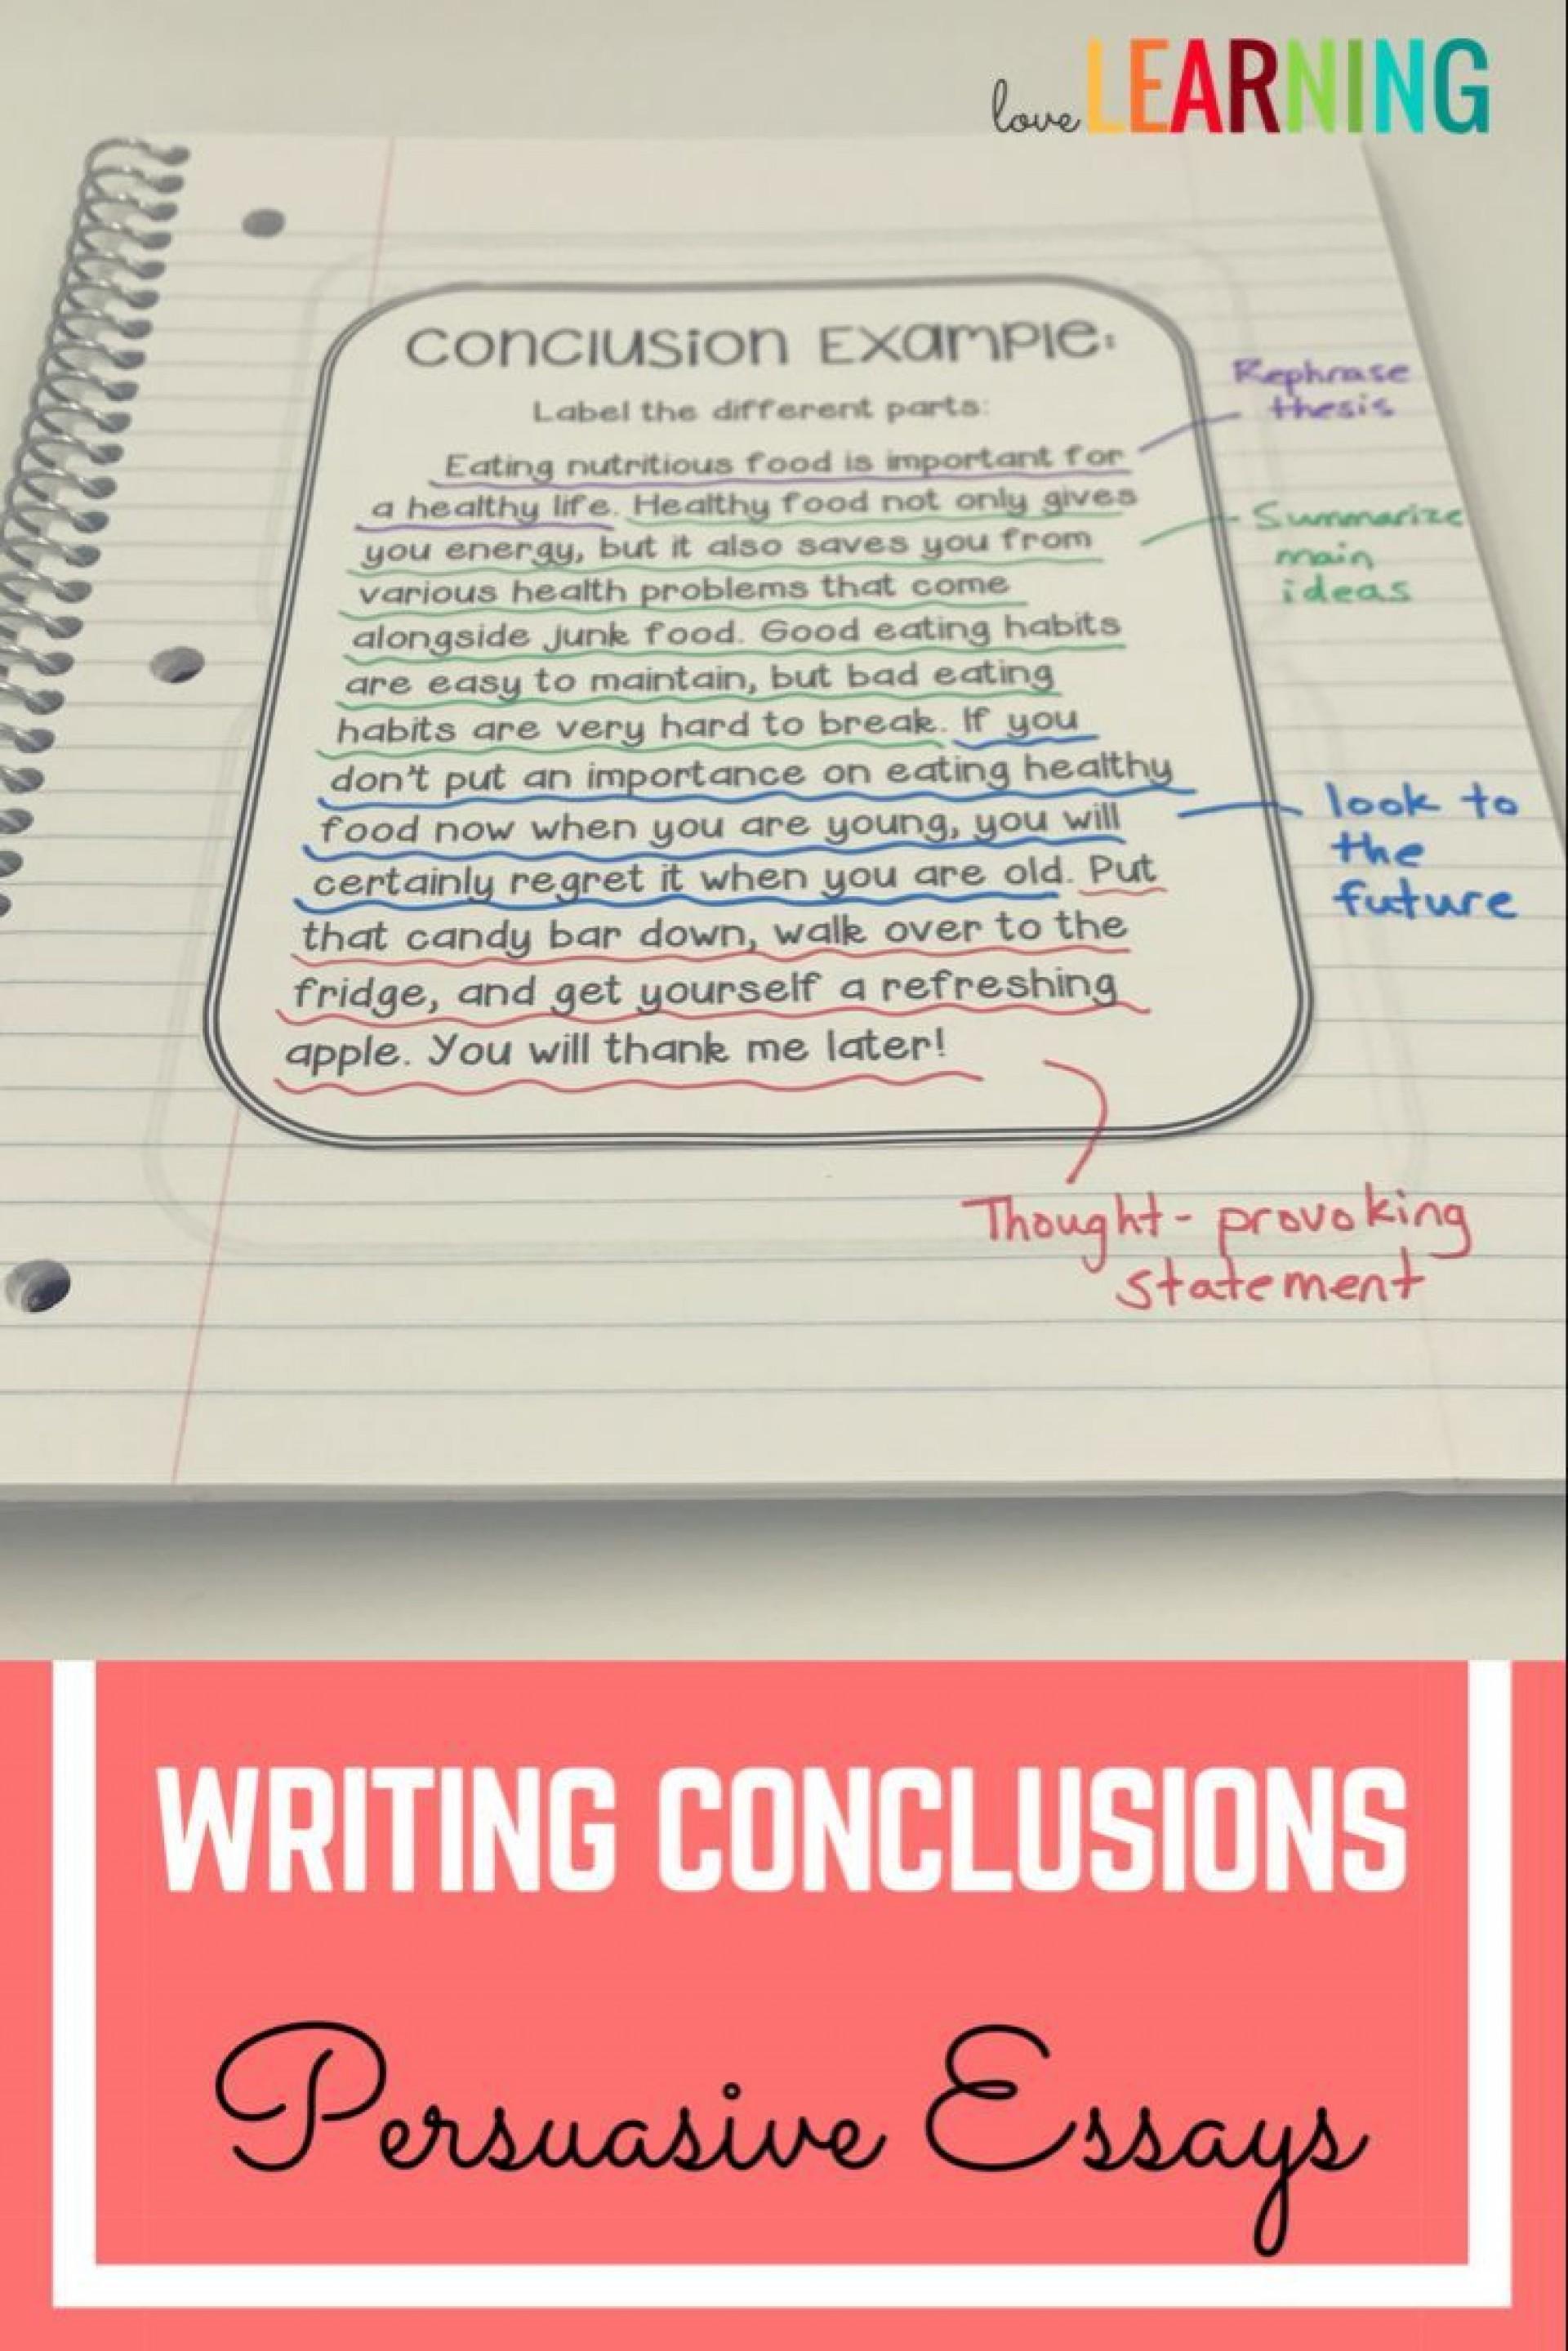 020 Persuasive Essay Conclusion Impressive Paragraph Examples Structure 1920